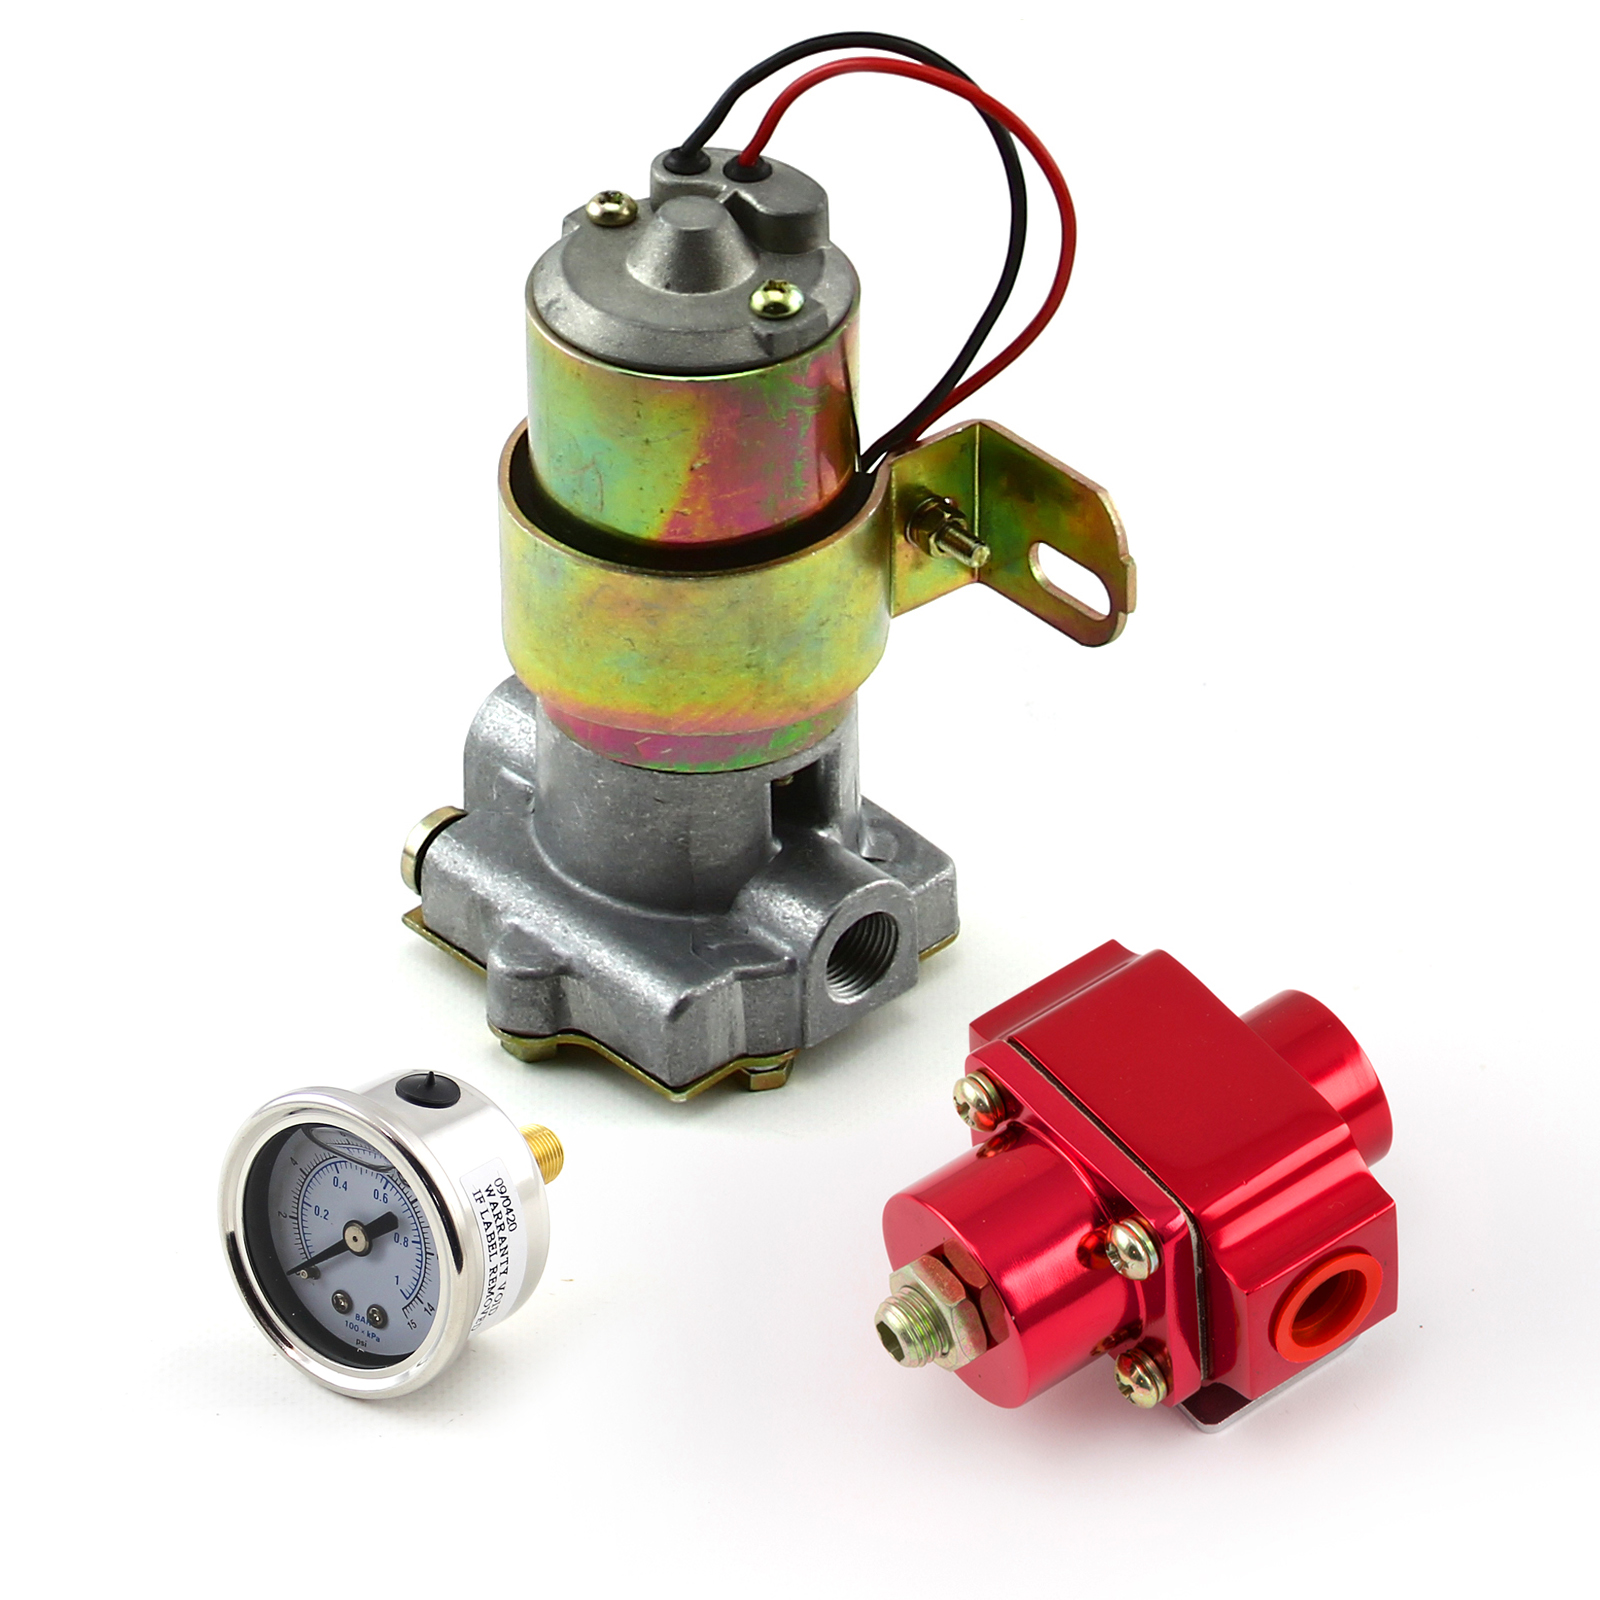 140 Gph Universal Electric Fuel Pump Red Regulator & Gauge Combo Kit